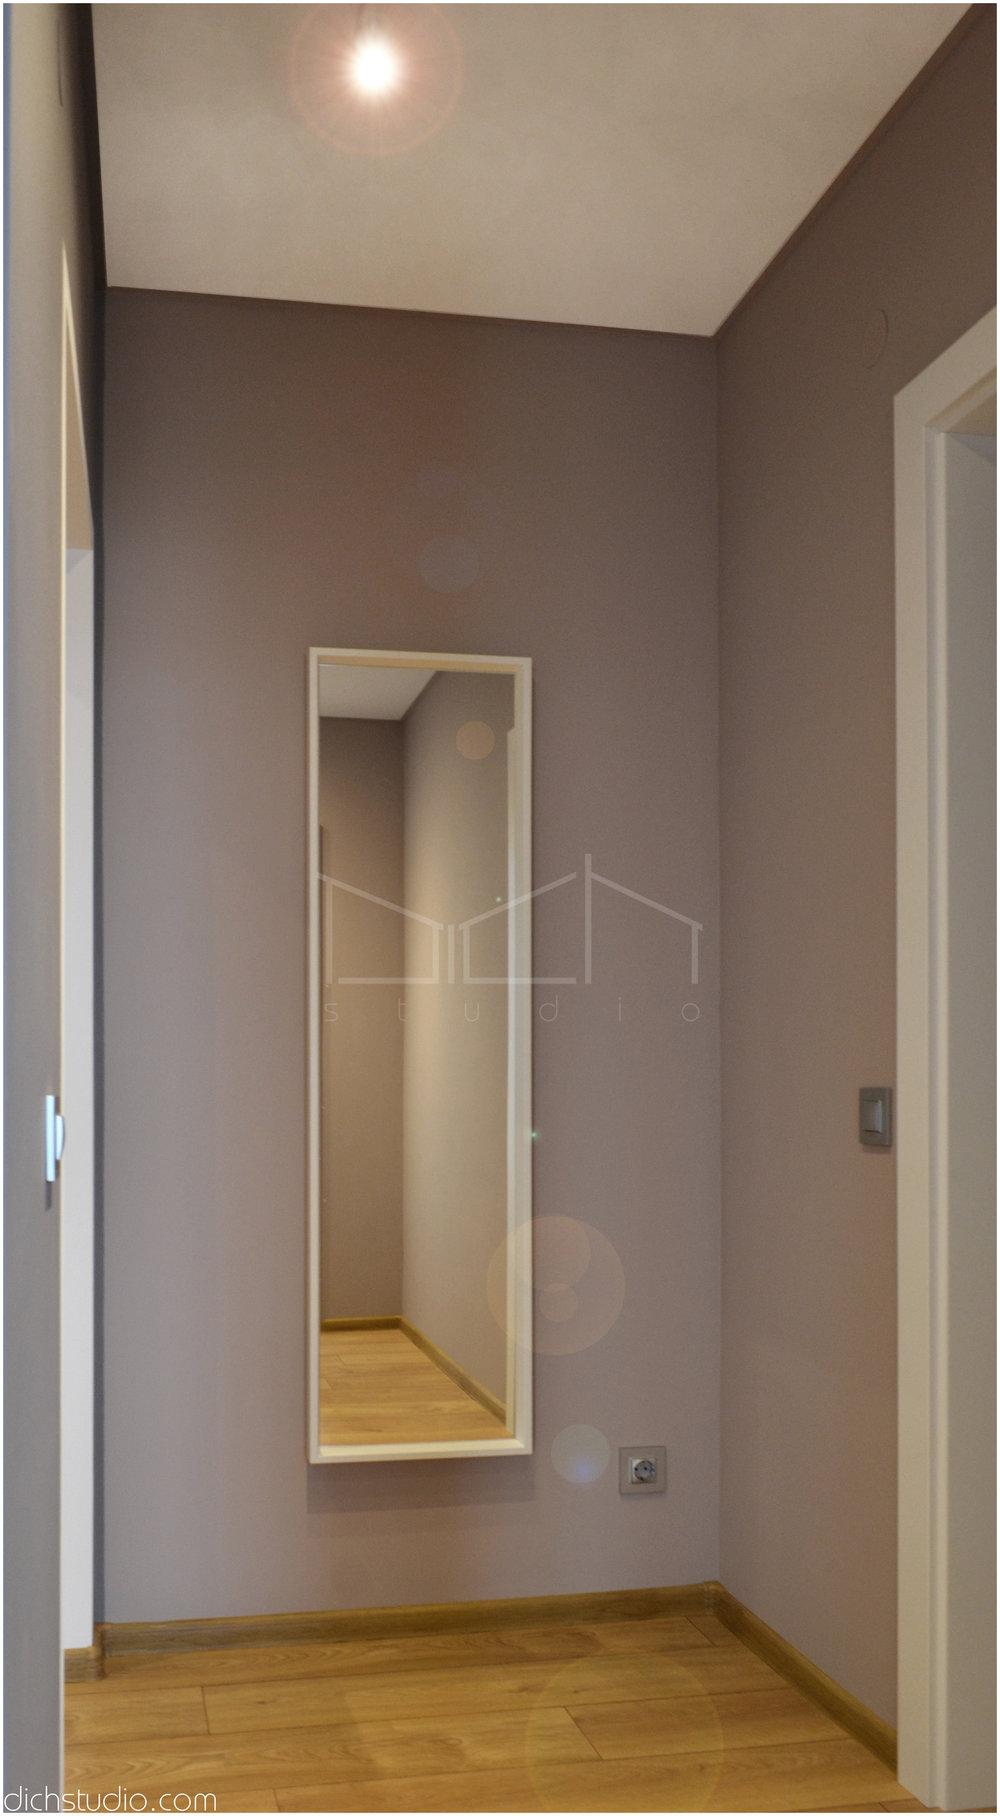 koridor ogledalo.JPG